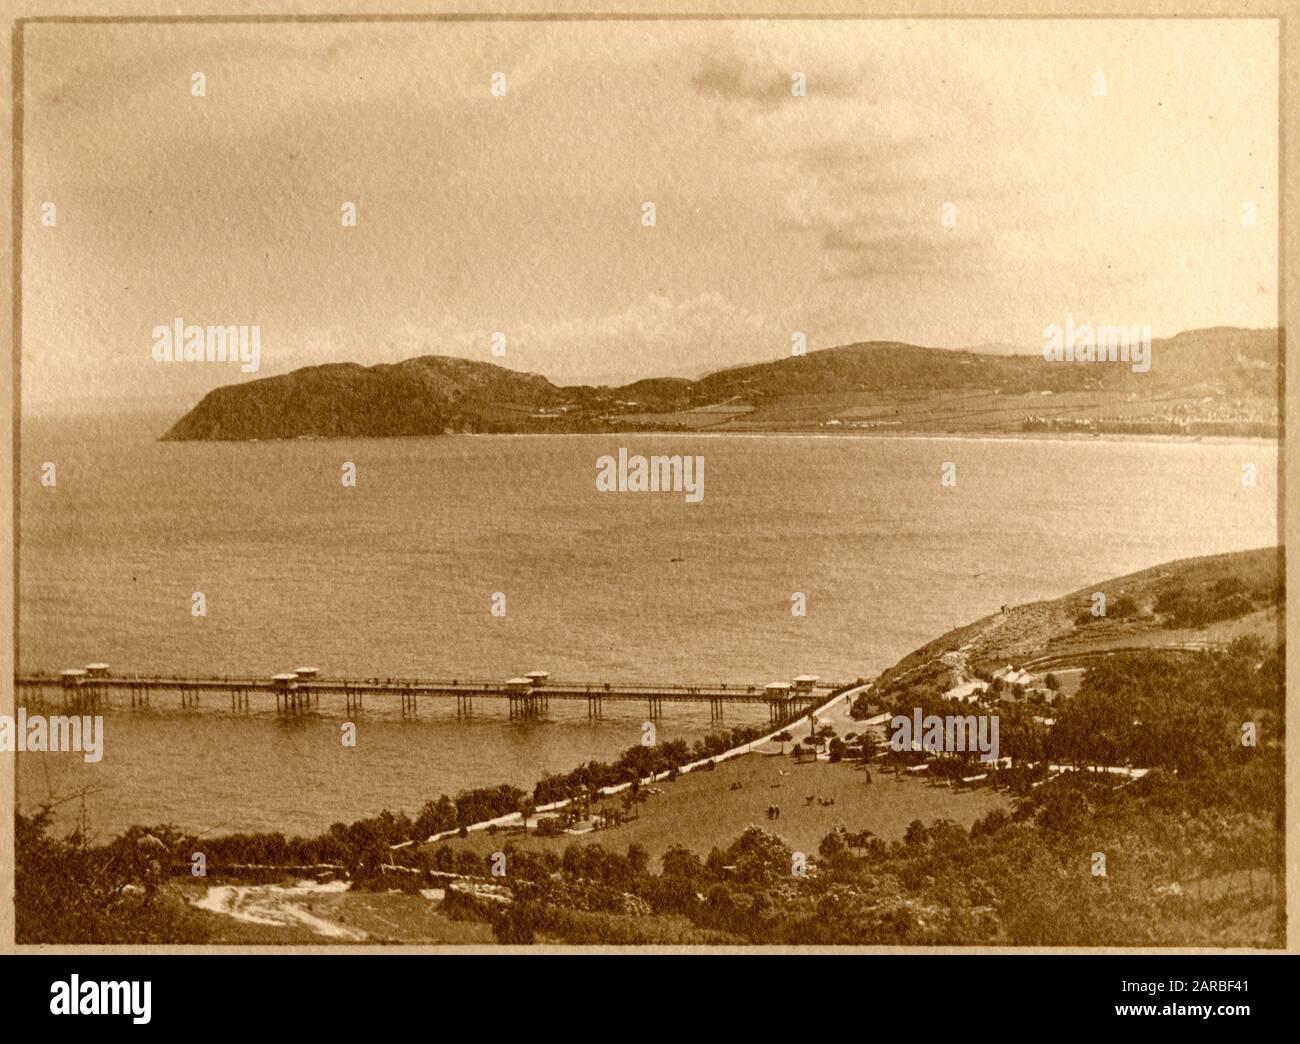 Fernblick auf den Pier, Llandudno, Nordwales. Datum: Ca. 1900s. Stockfoto